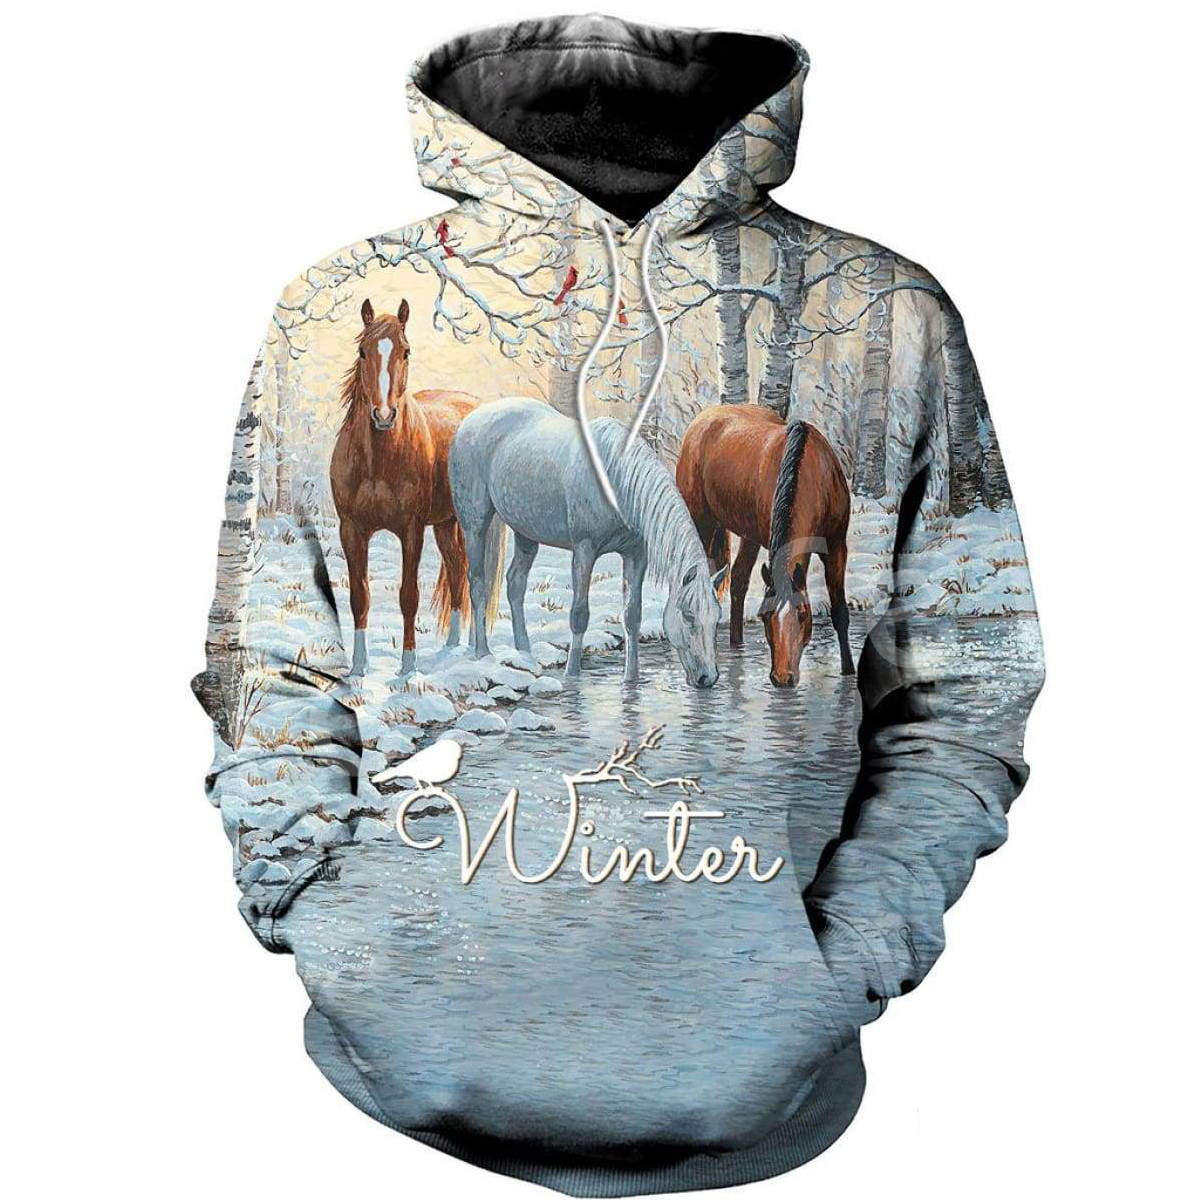 Tessffel Animal Horse Art Unisex Colorful Casual Tracksuit Harajuku 3Dfull Print Hoodie/Sweatshirt/Jacket/Mens Womens S-8